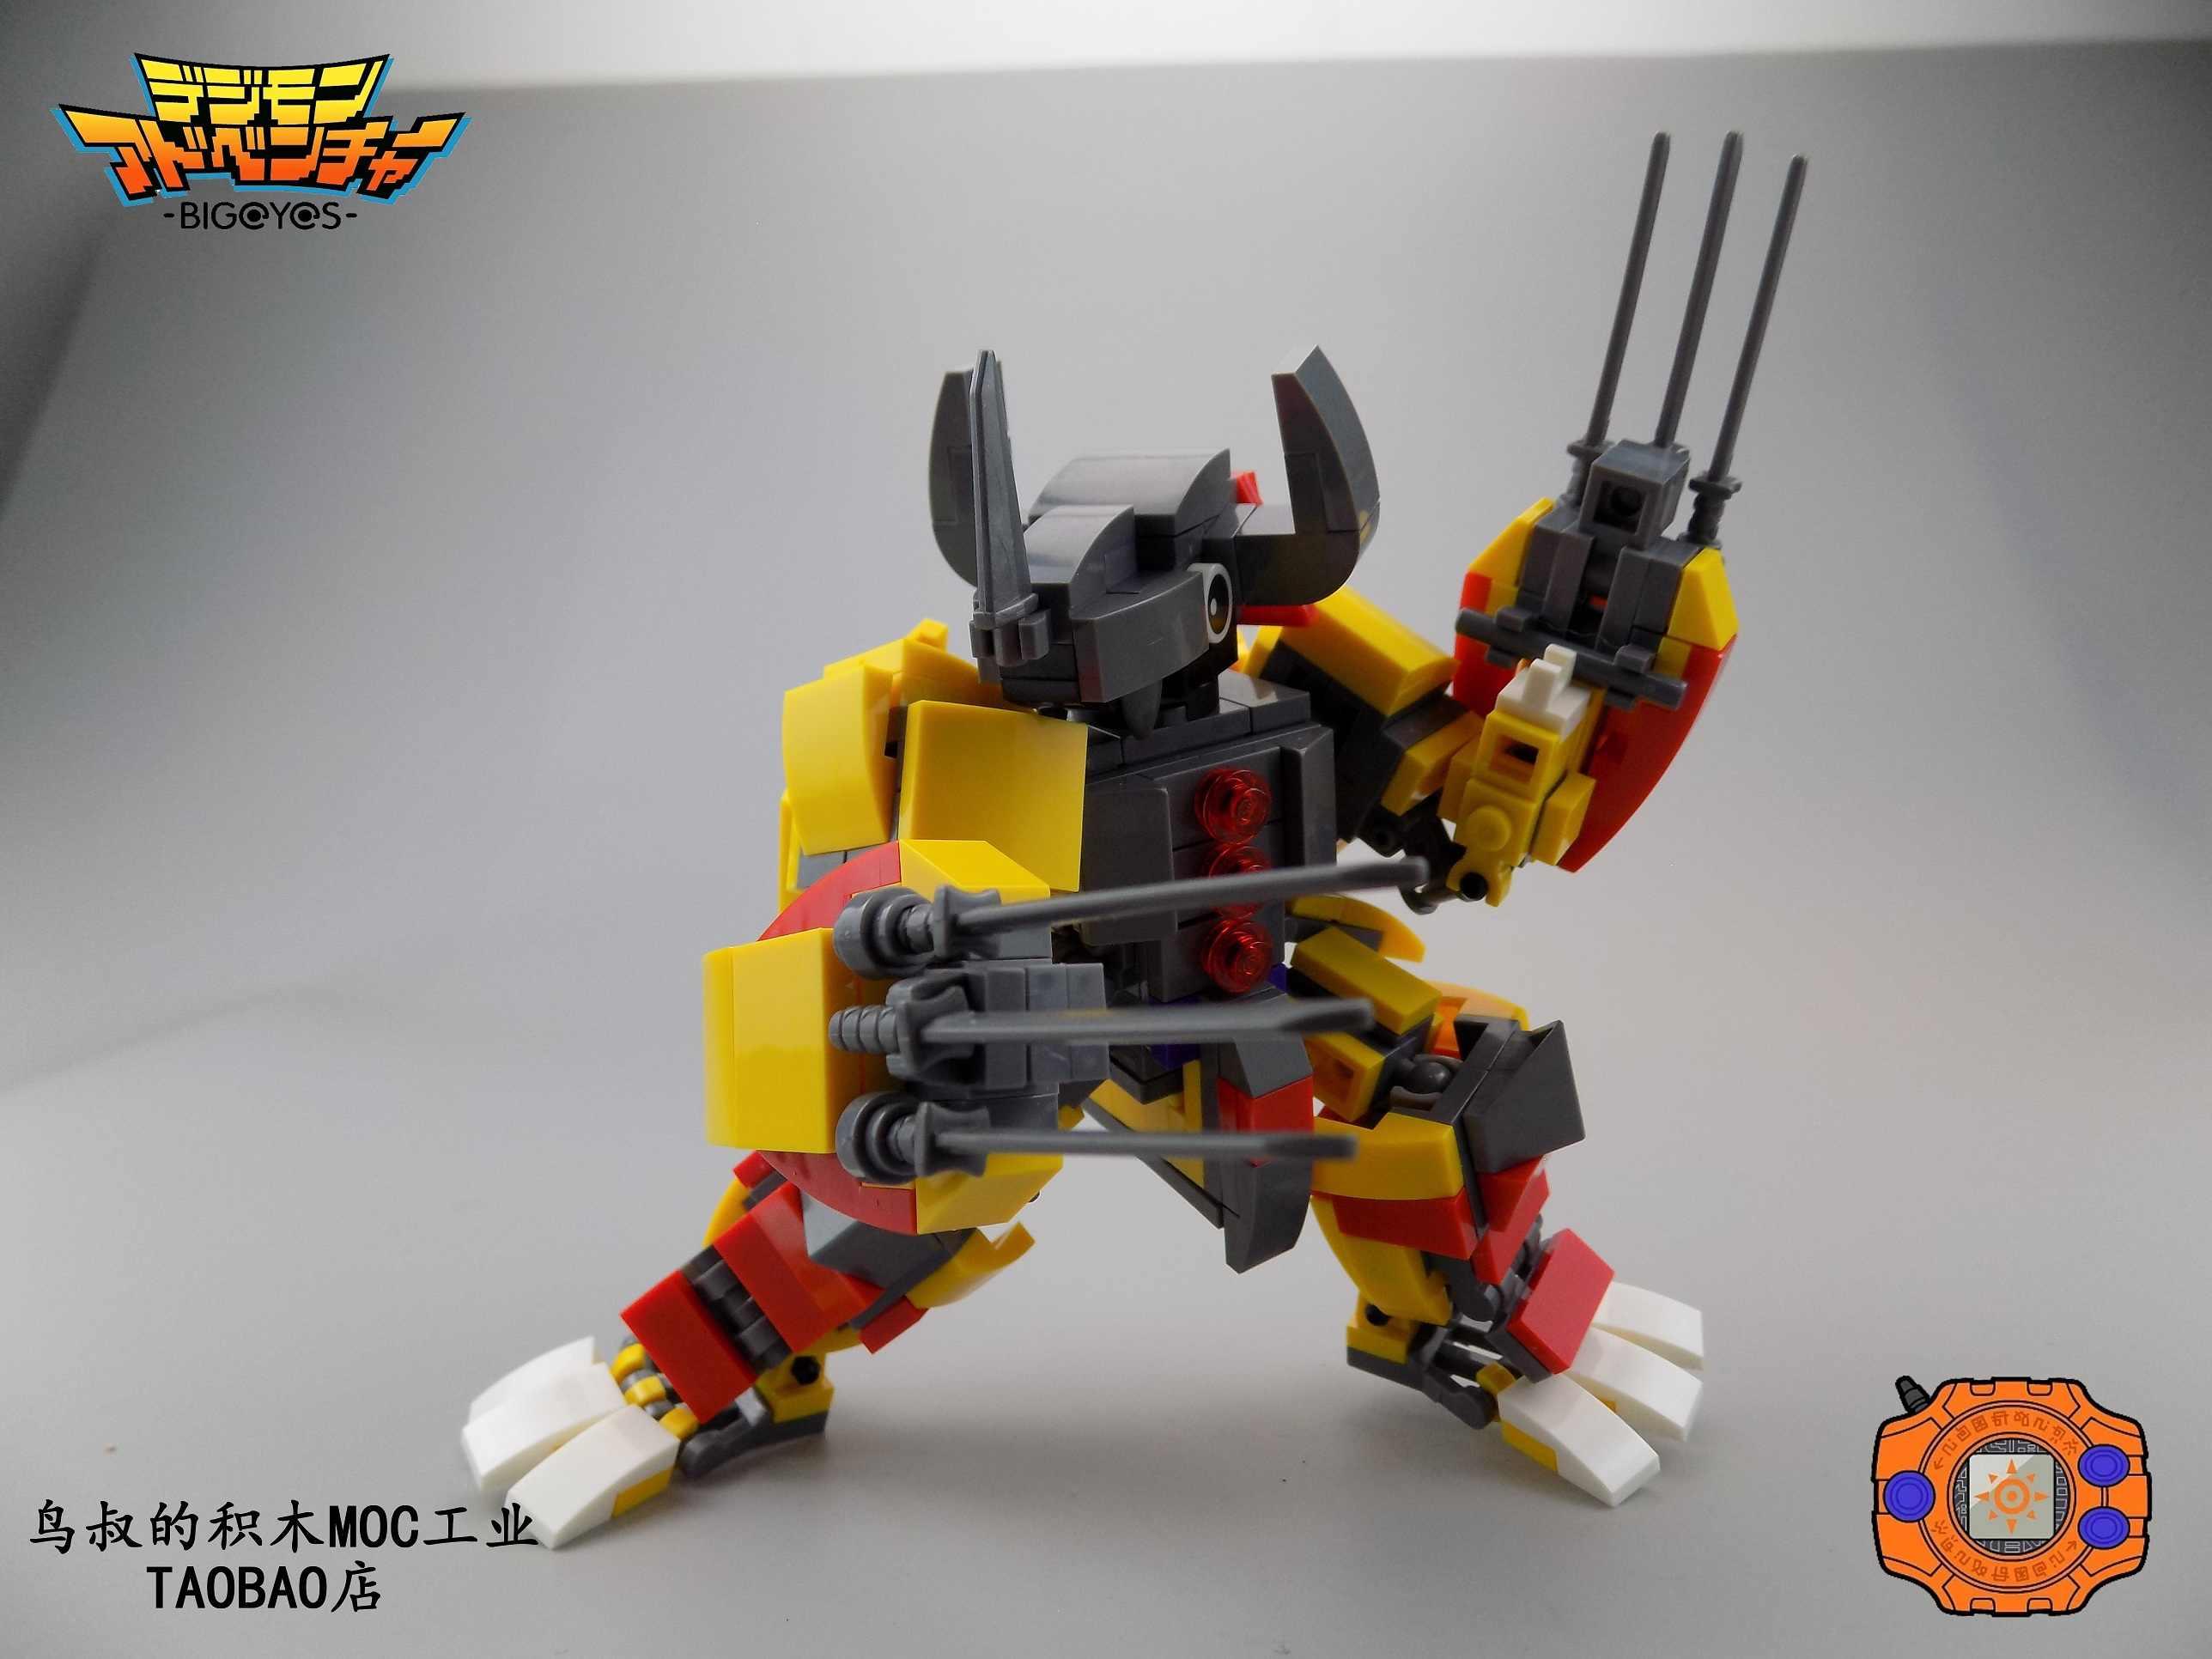 Blocks MOC Compatible Legoelys WarGreymon  Digital Monster